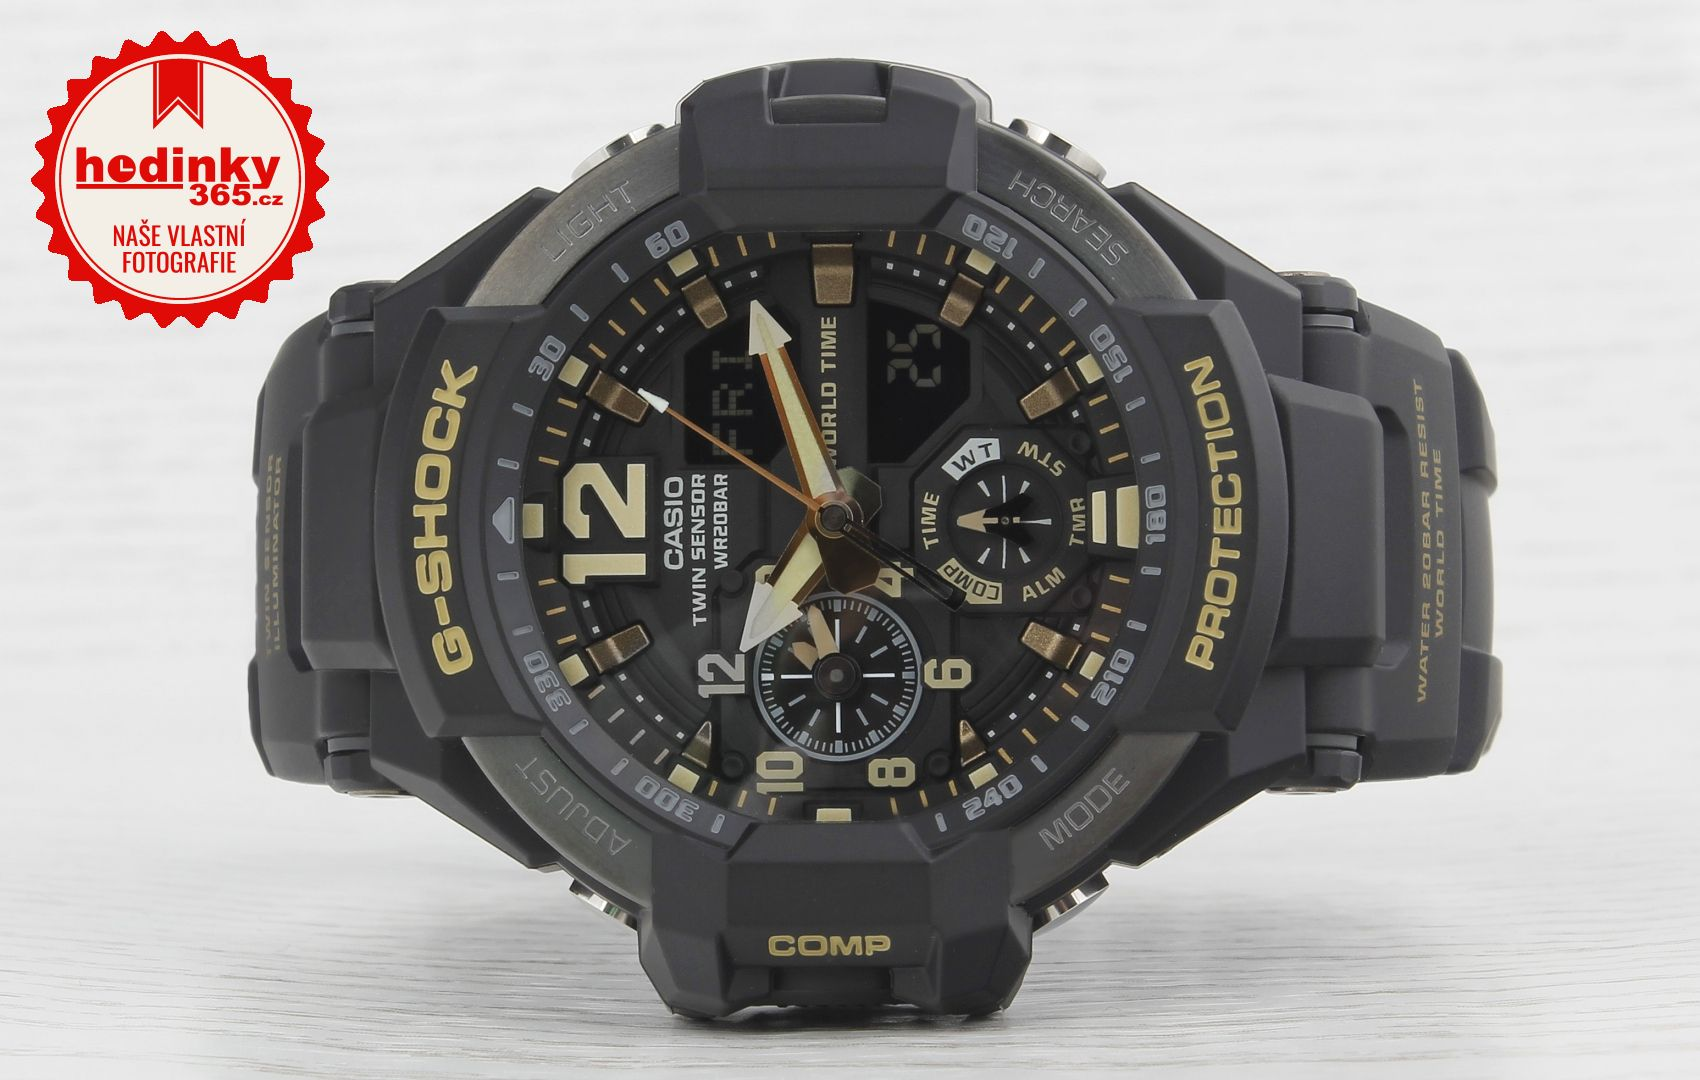 64ea0f5e36d Casio G-Shock Gravitymaster GA-1100GB-1AER Black   Gold Special ...